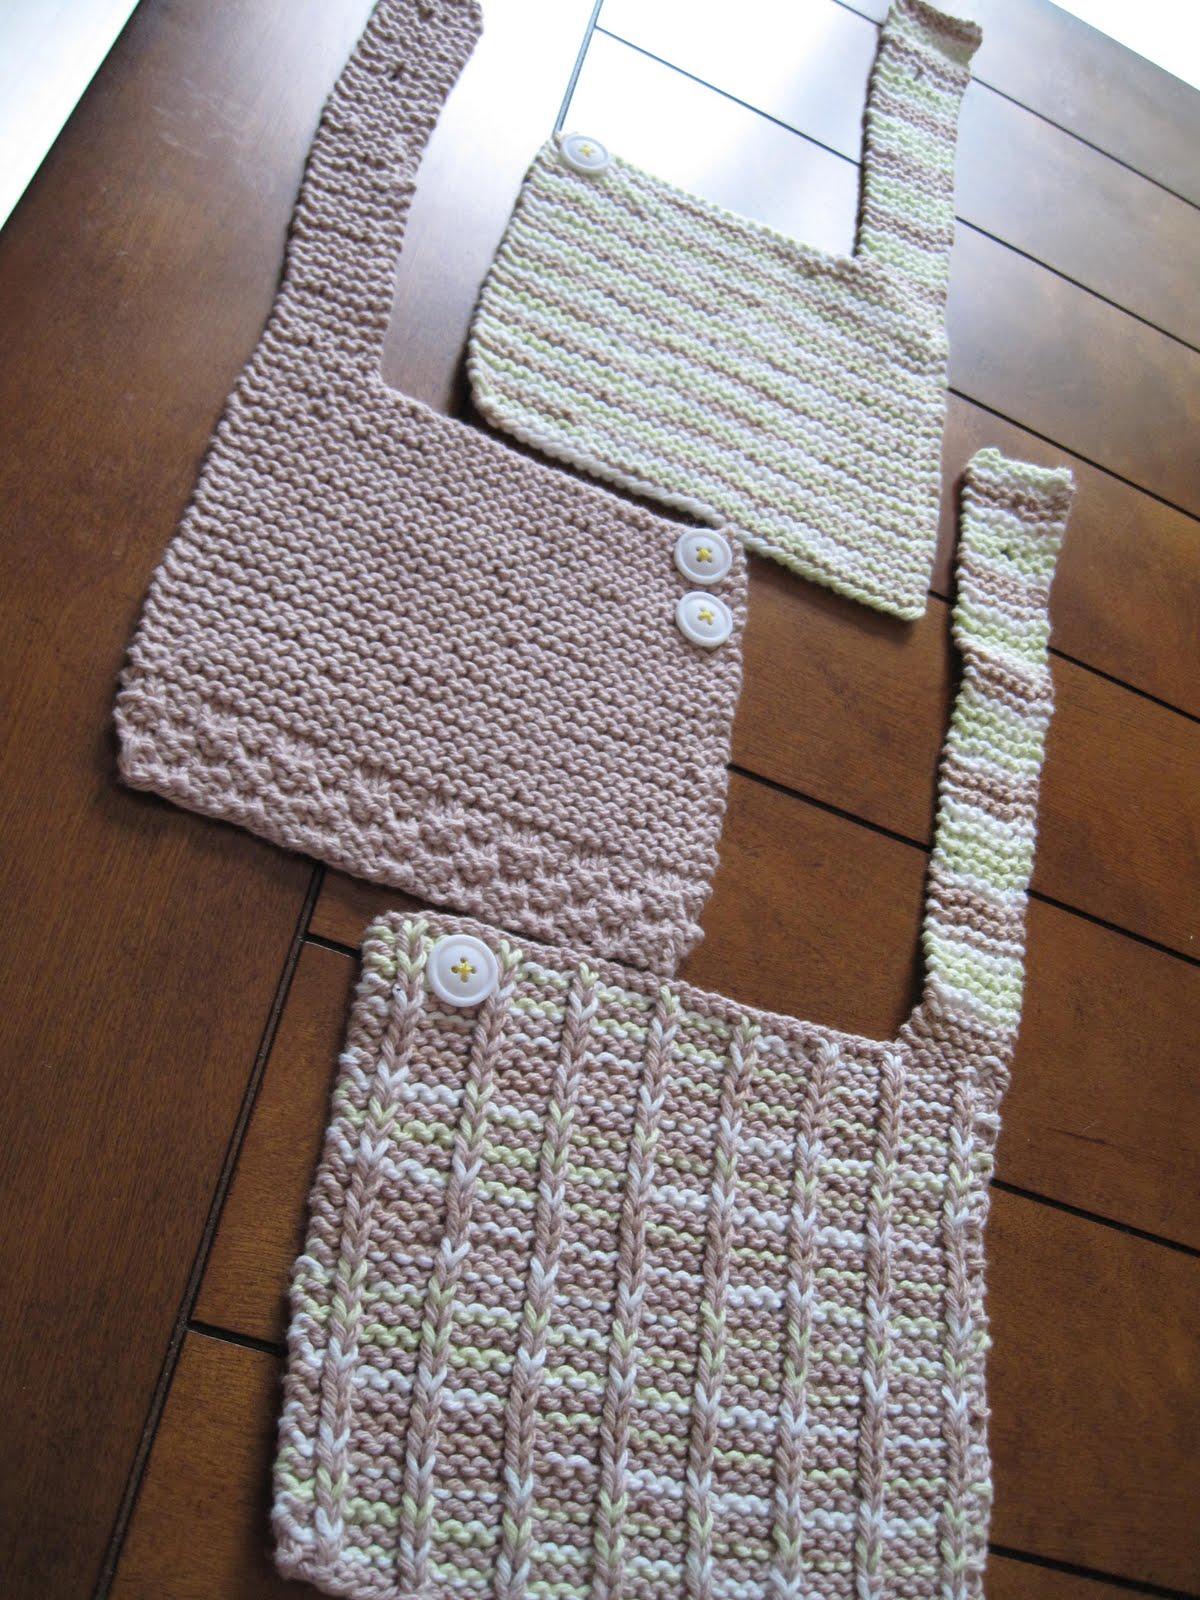 Knitting Like Crazy: Some Baby Bibs